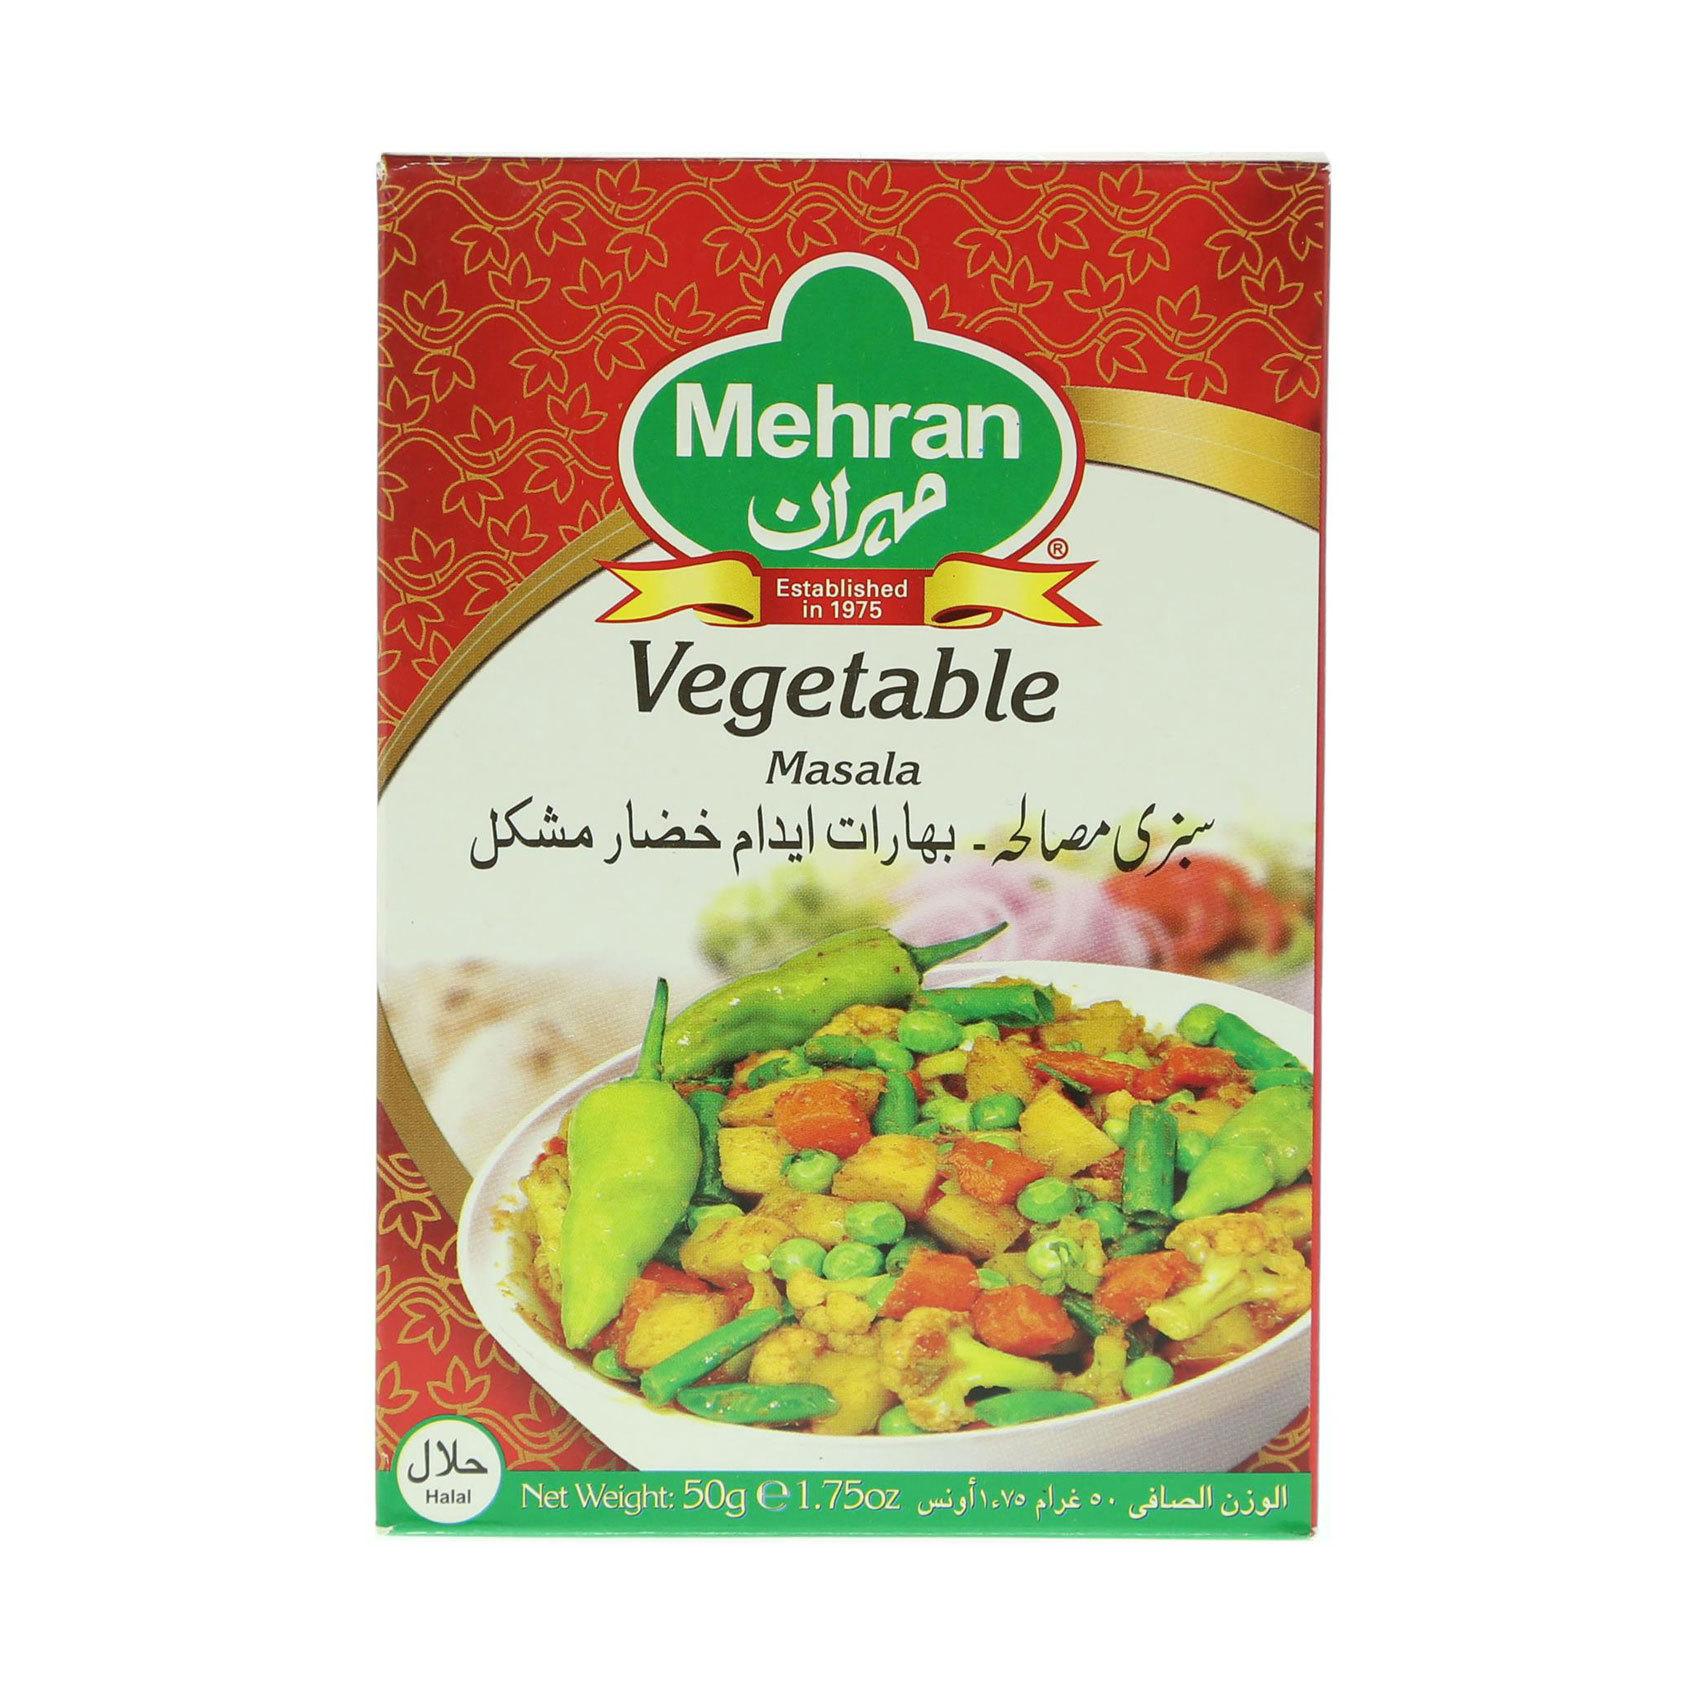 MEHRAN VEGETABLE MASALA POWDER 50GR